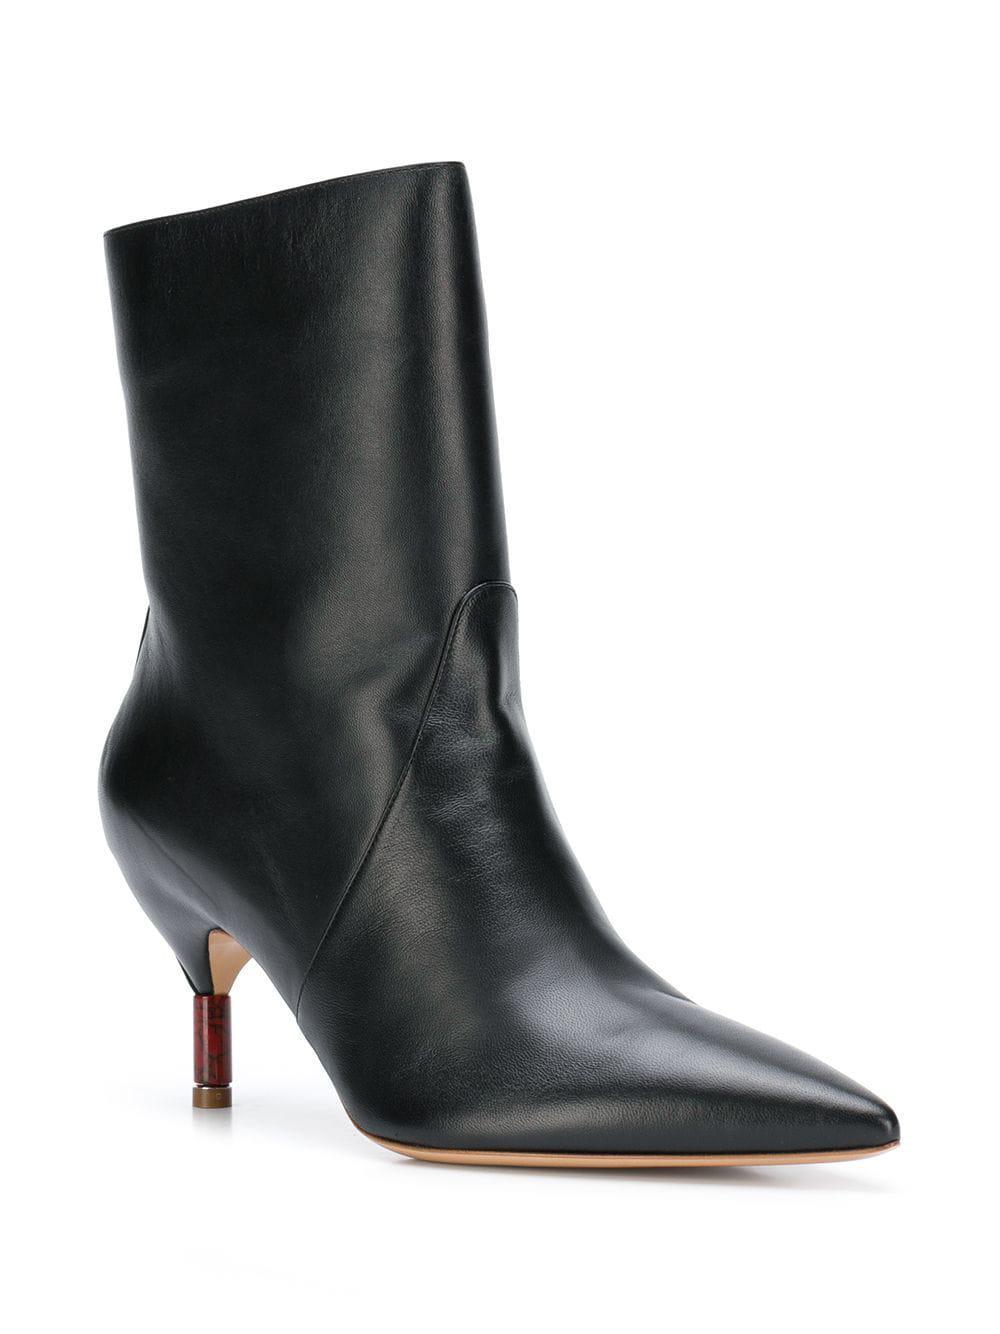 4e3b8219a15 Lyst - Gabriela Hearst Mariana Ankle Boots in Black - Save 31%